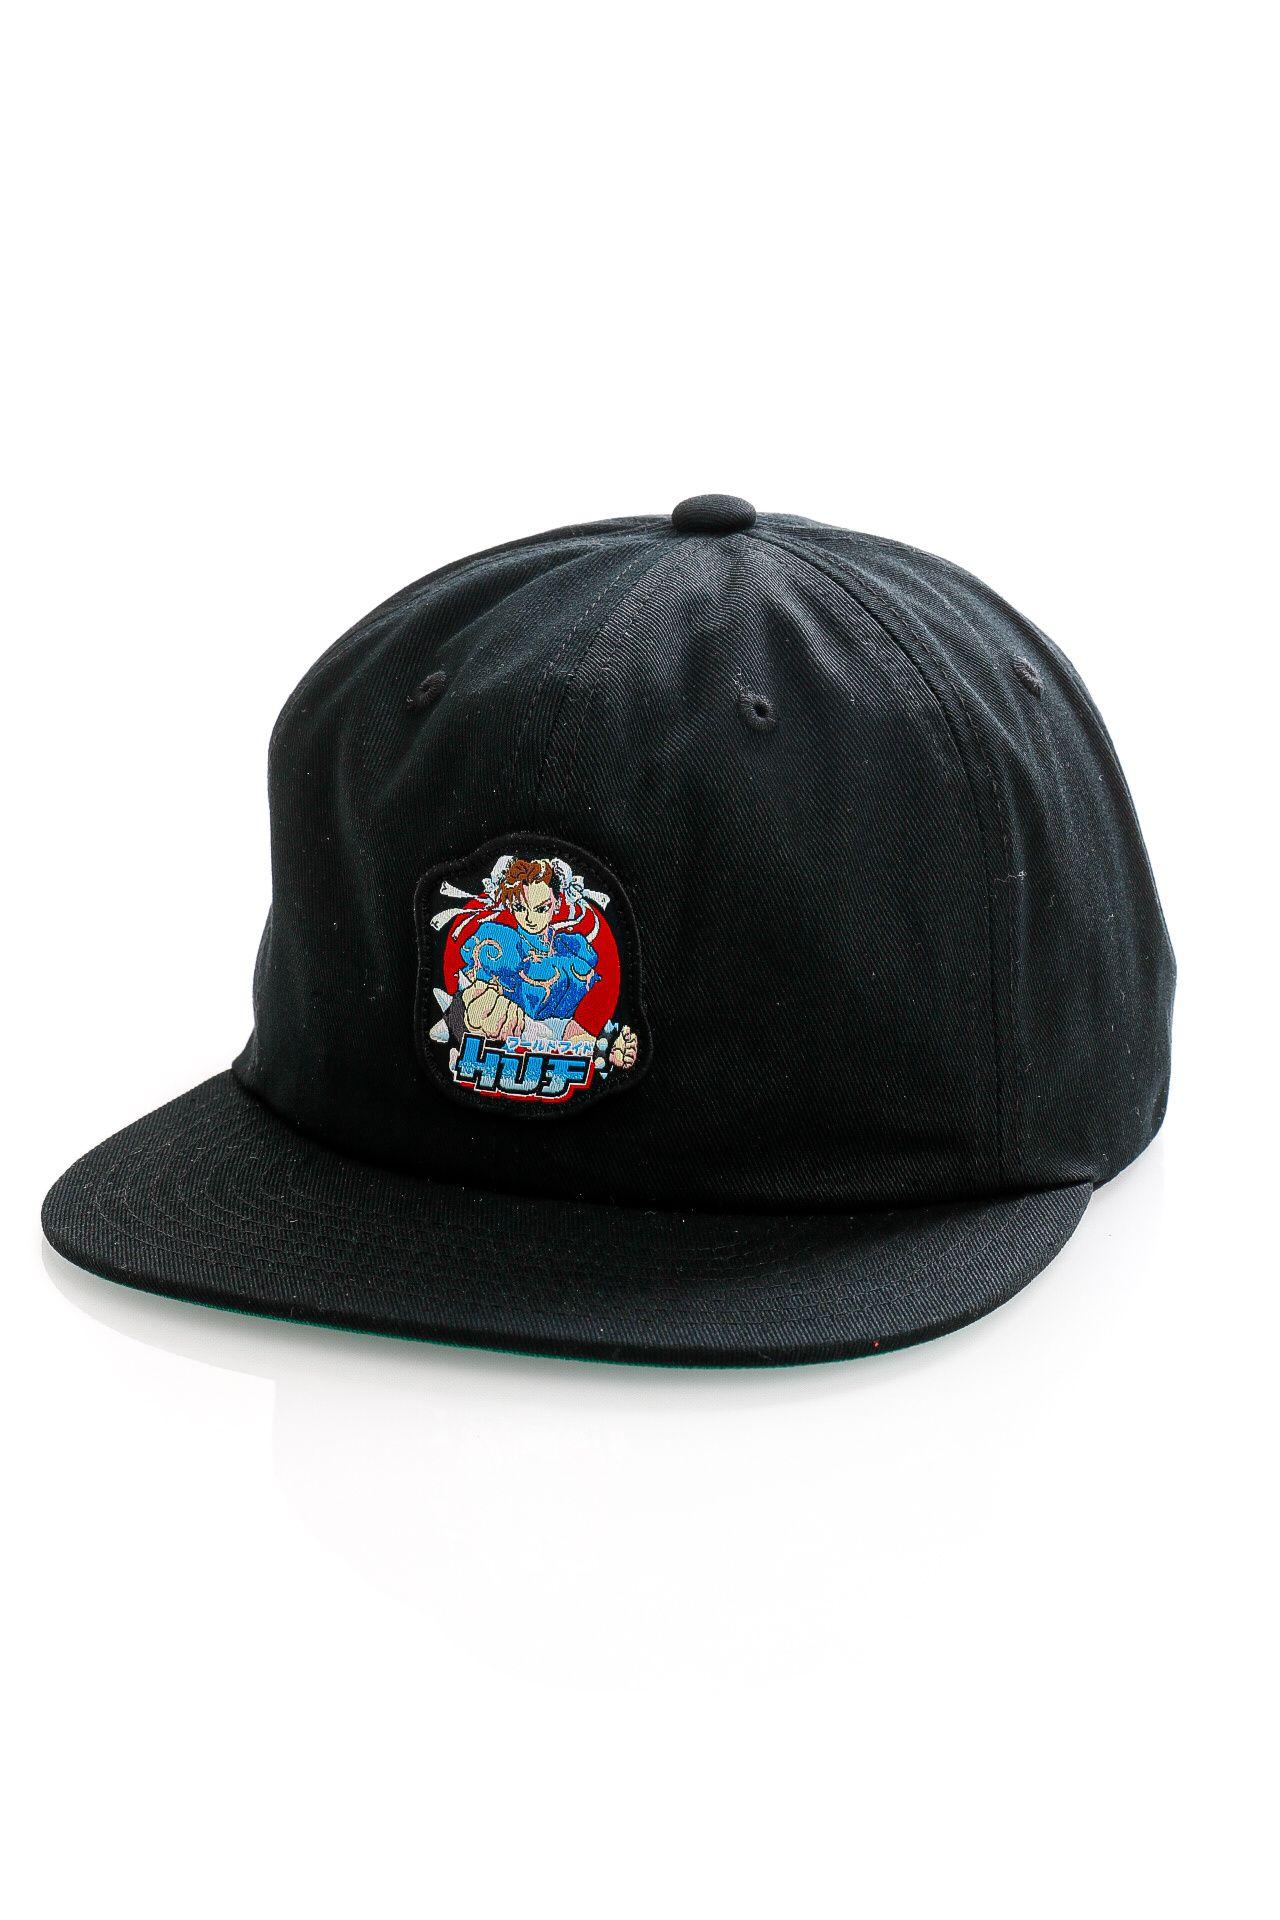 Afbeelding van HUF Snapback Cap Chun-Li Snapback Hat Black HT00601